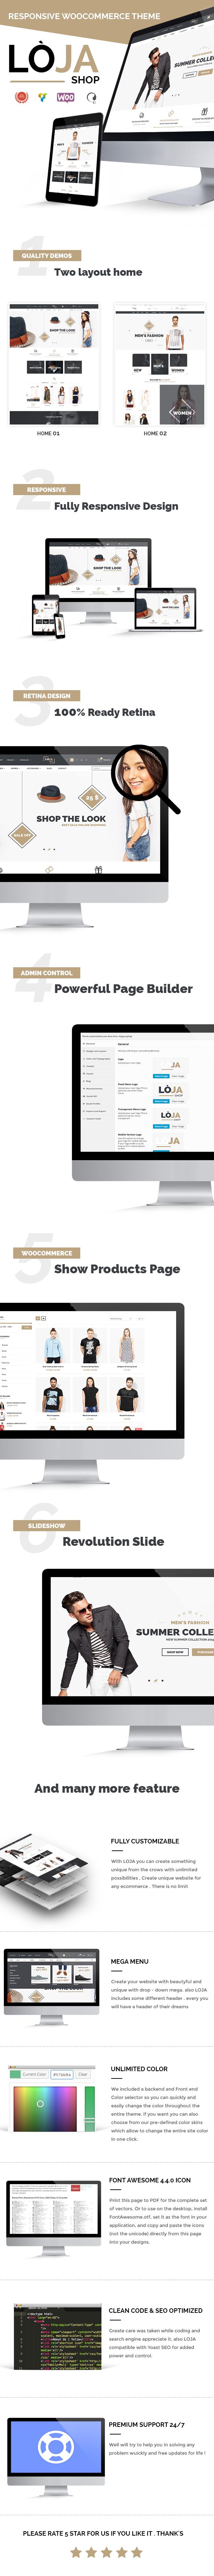 Loja - Responsive WooCommerce Theme